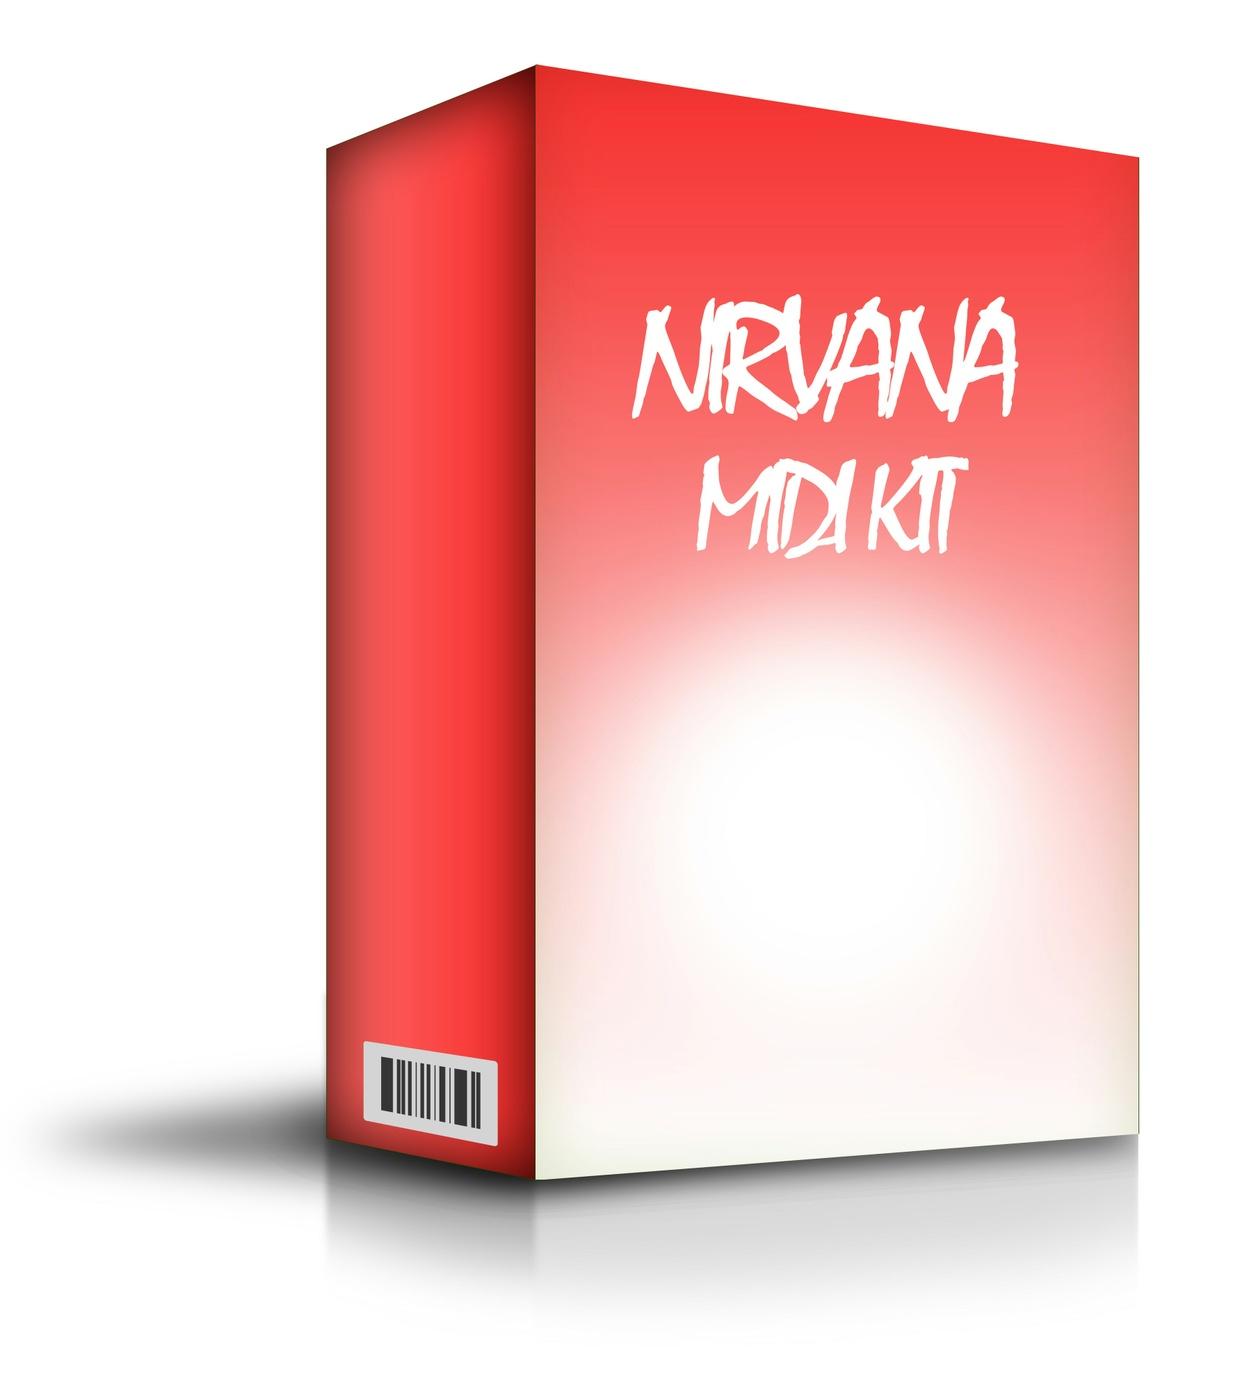 Nirvana Midi Kit